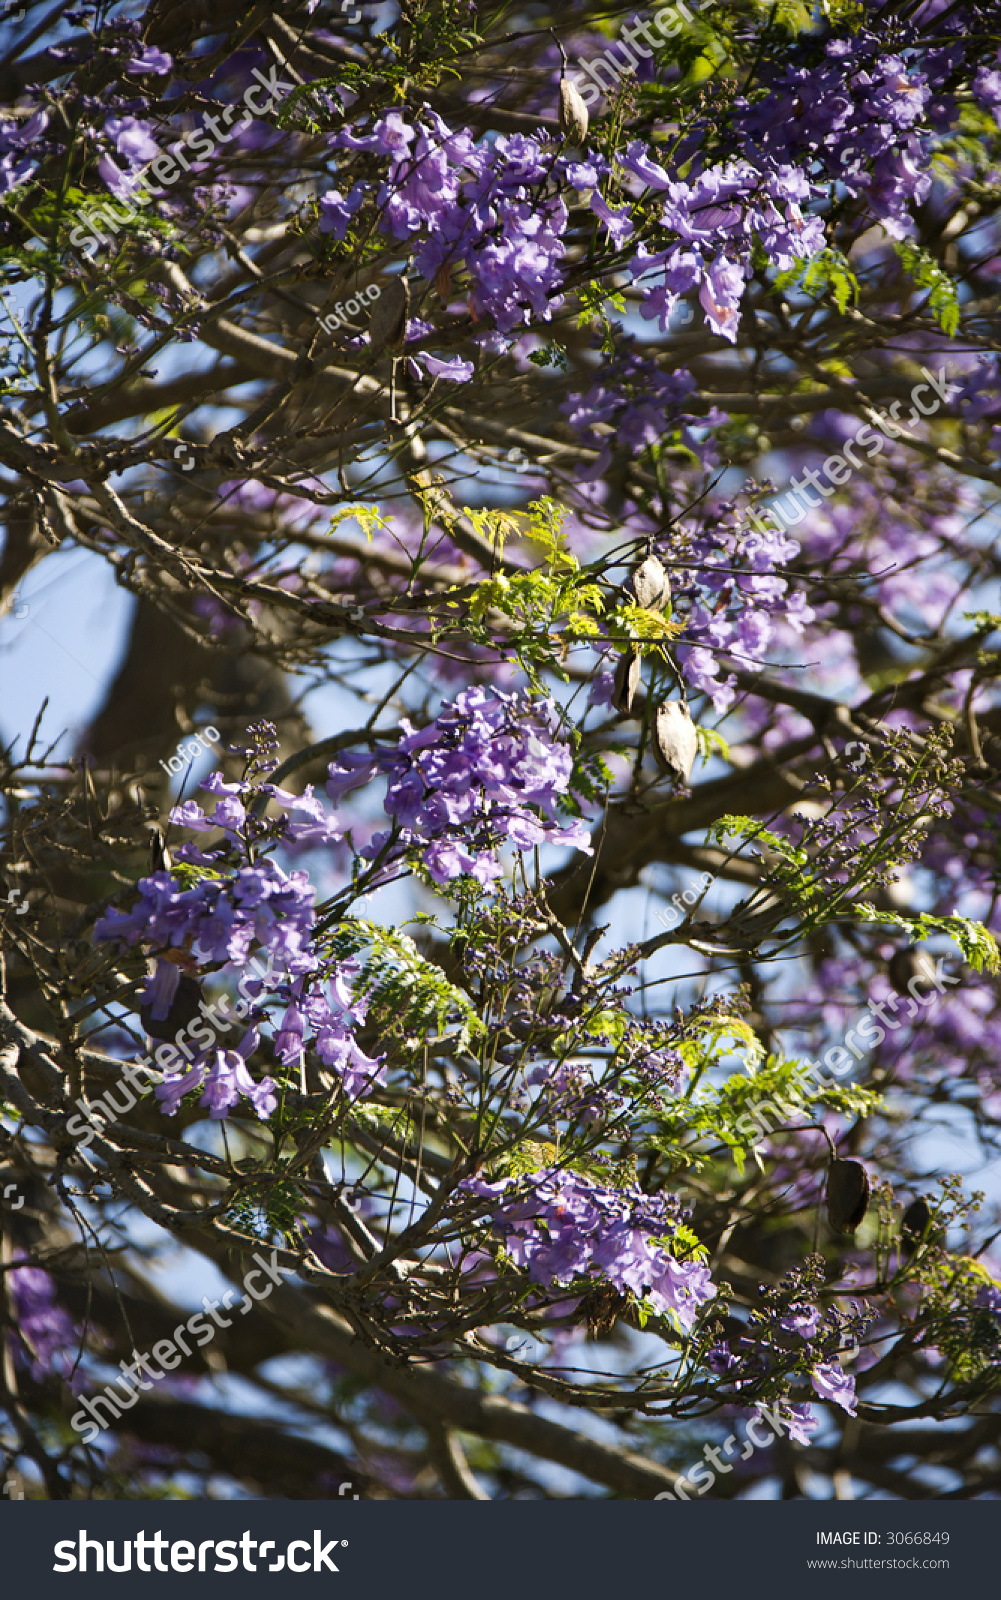 Closeup Jacaranda Tree Blooming Purple Flowers Stock Photo Edit Now